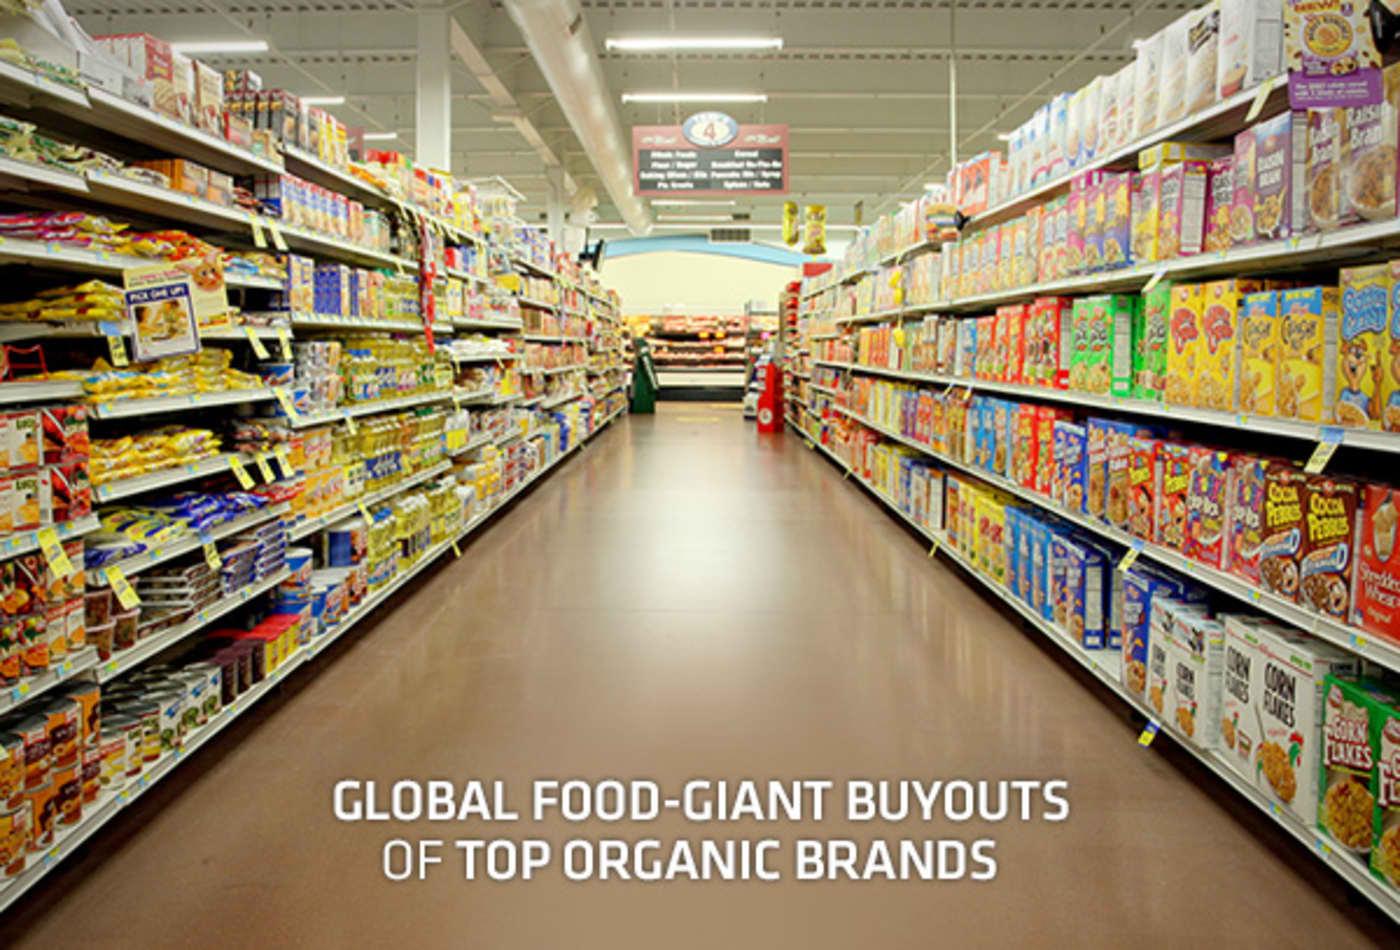 Global Food-Giant Buyouts of Top Organic Brands